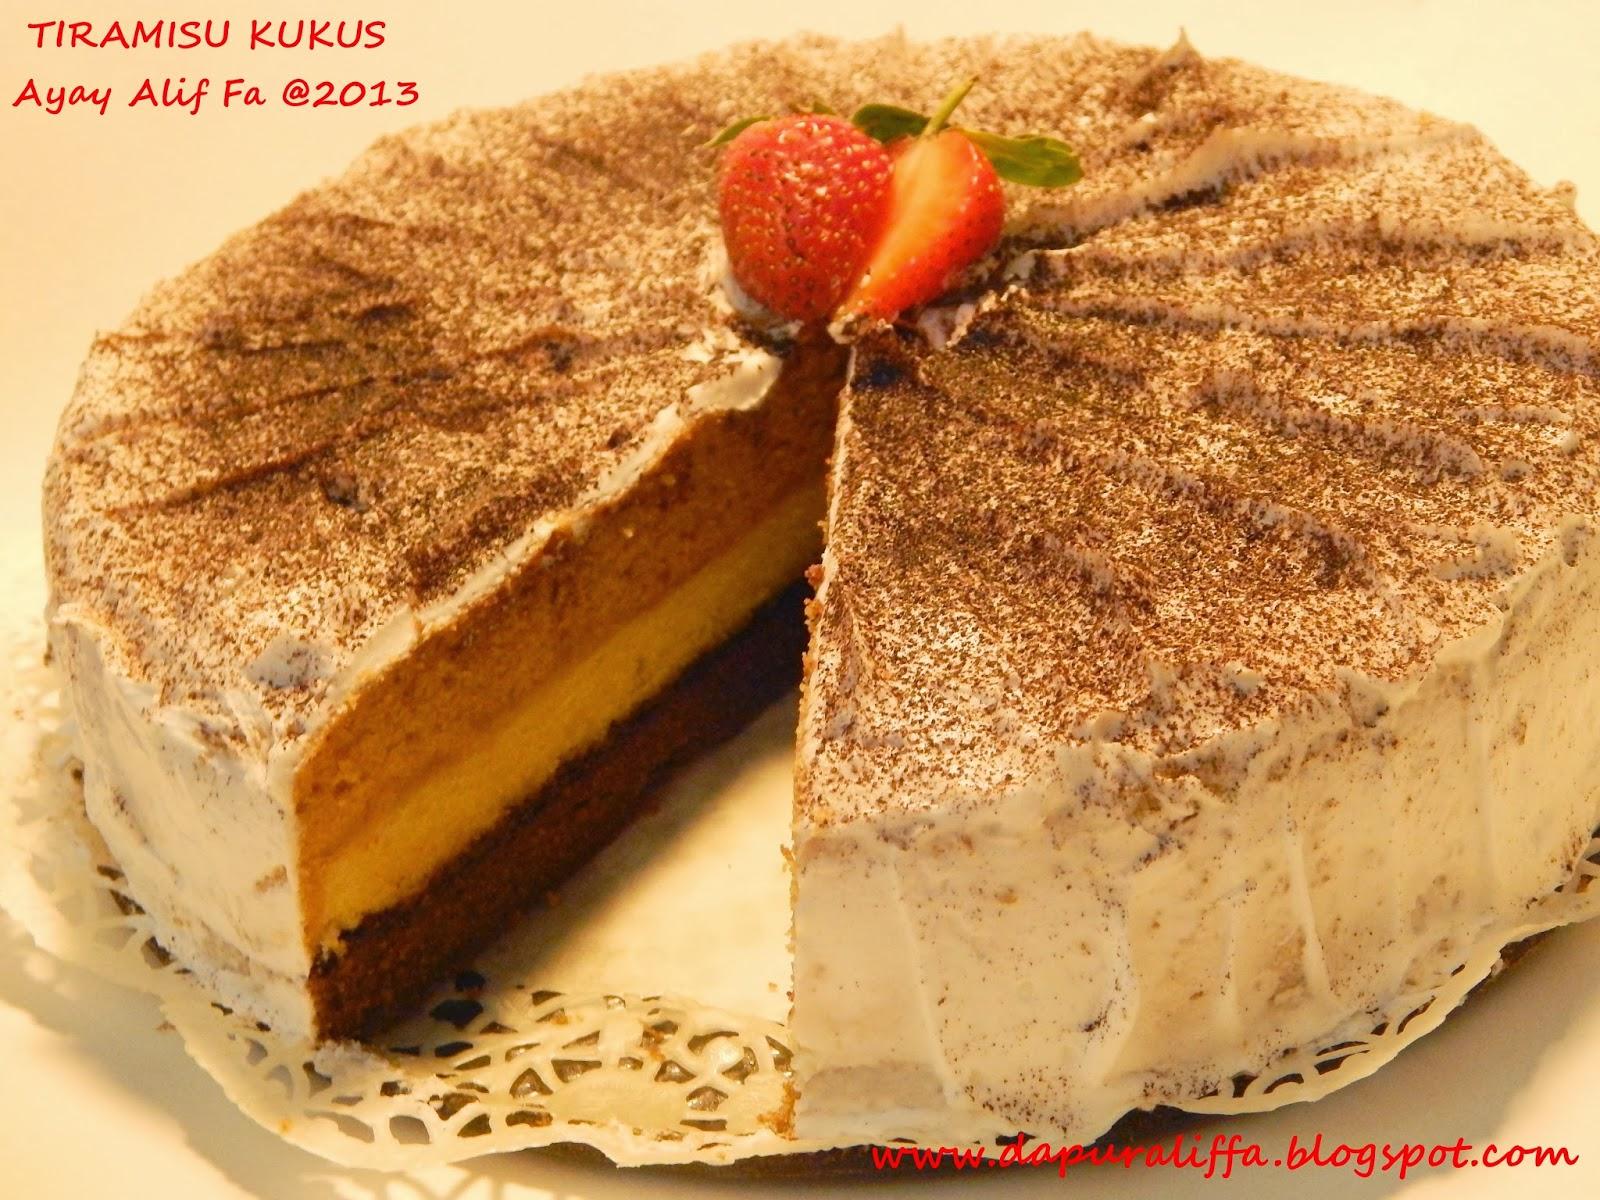 Resep Cake Tiramisu Jtt: TIRAMISU KUKUS Sajian Sedap Cakes